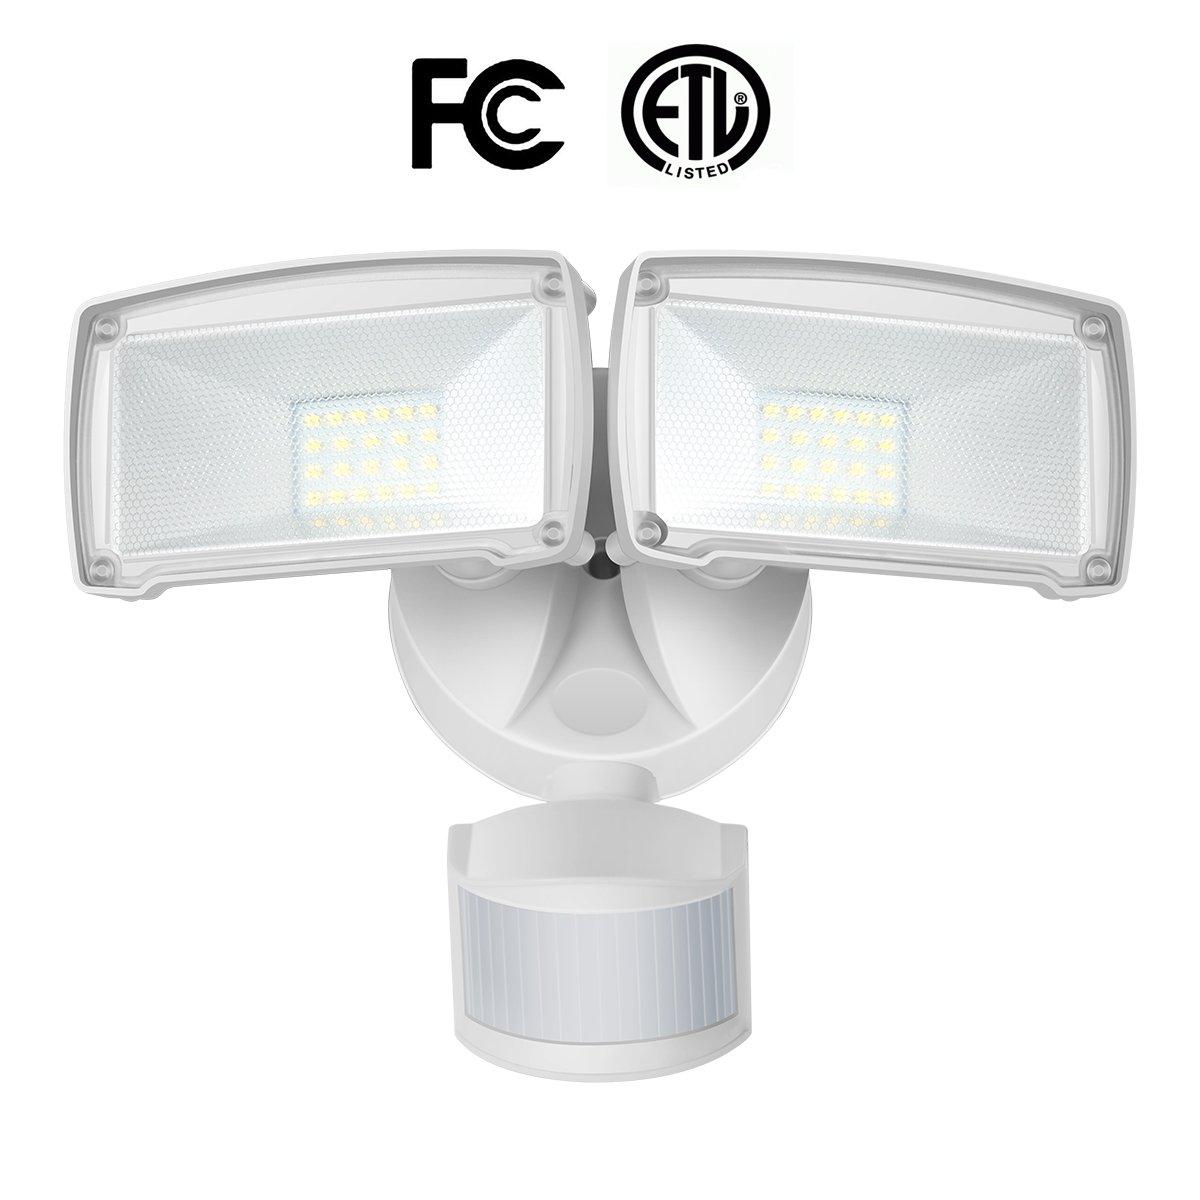 22w dual head motion sensor led outdoor security light3 lighting 22w dual head motion sensor led outdoor security light3 lighting modesadjustable head5000k daylight 1600lm100w halogen equiv illumination for yard aloadofball Images